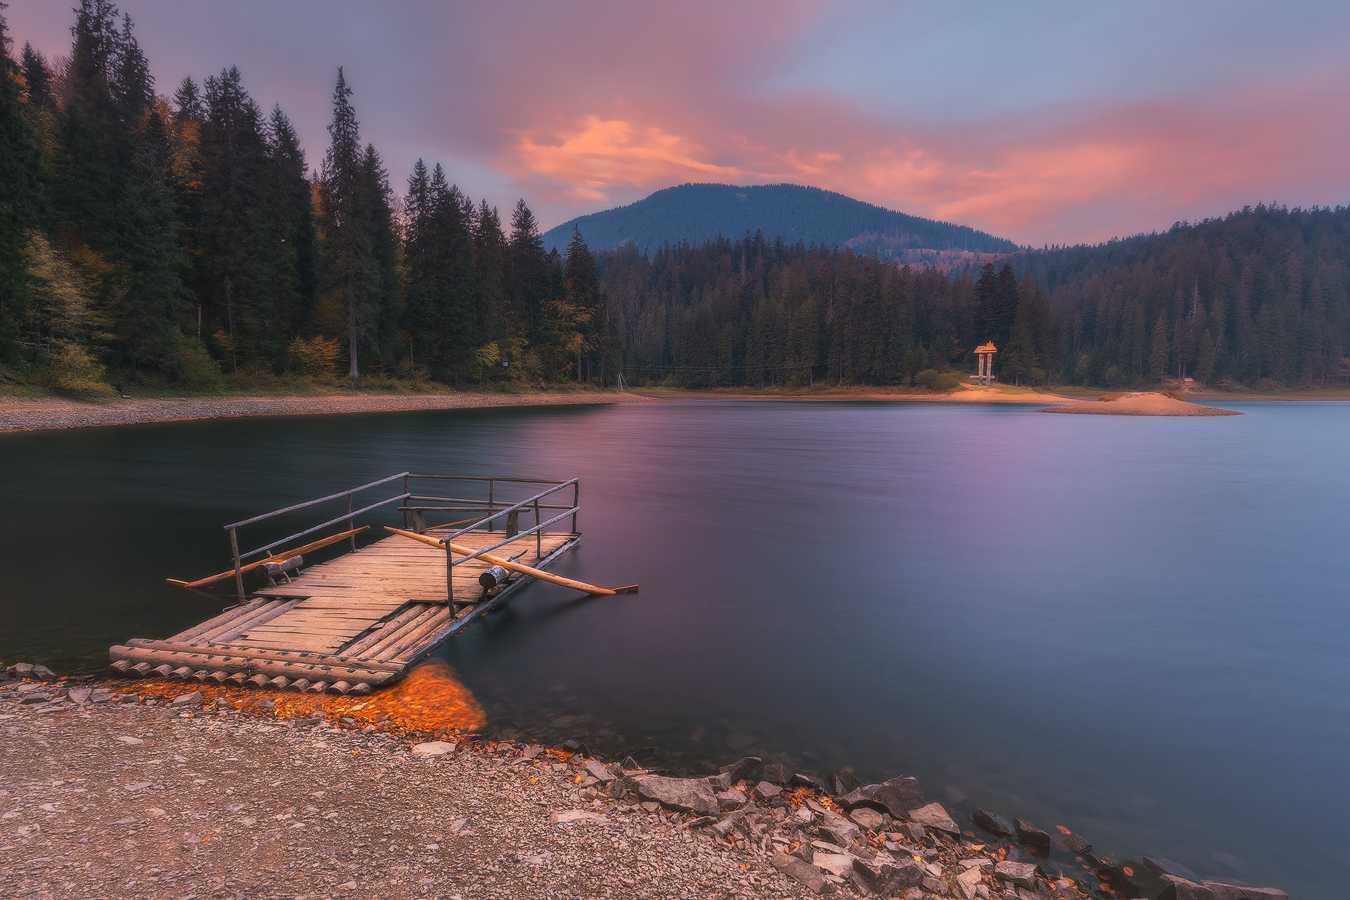 Украина. Закарпатье. Озеро Синевир